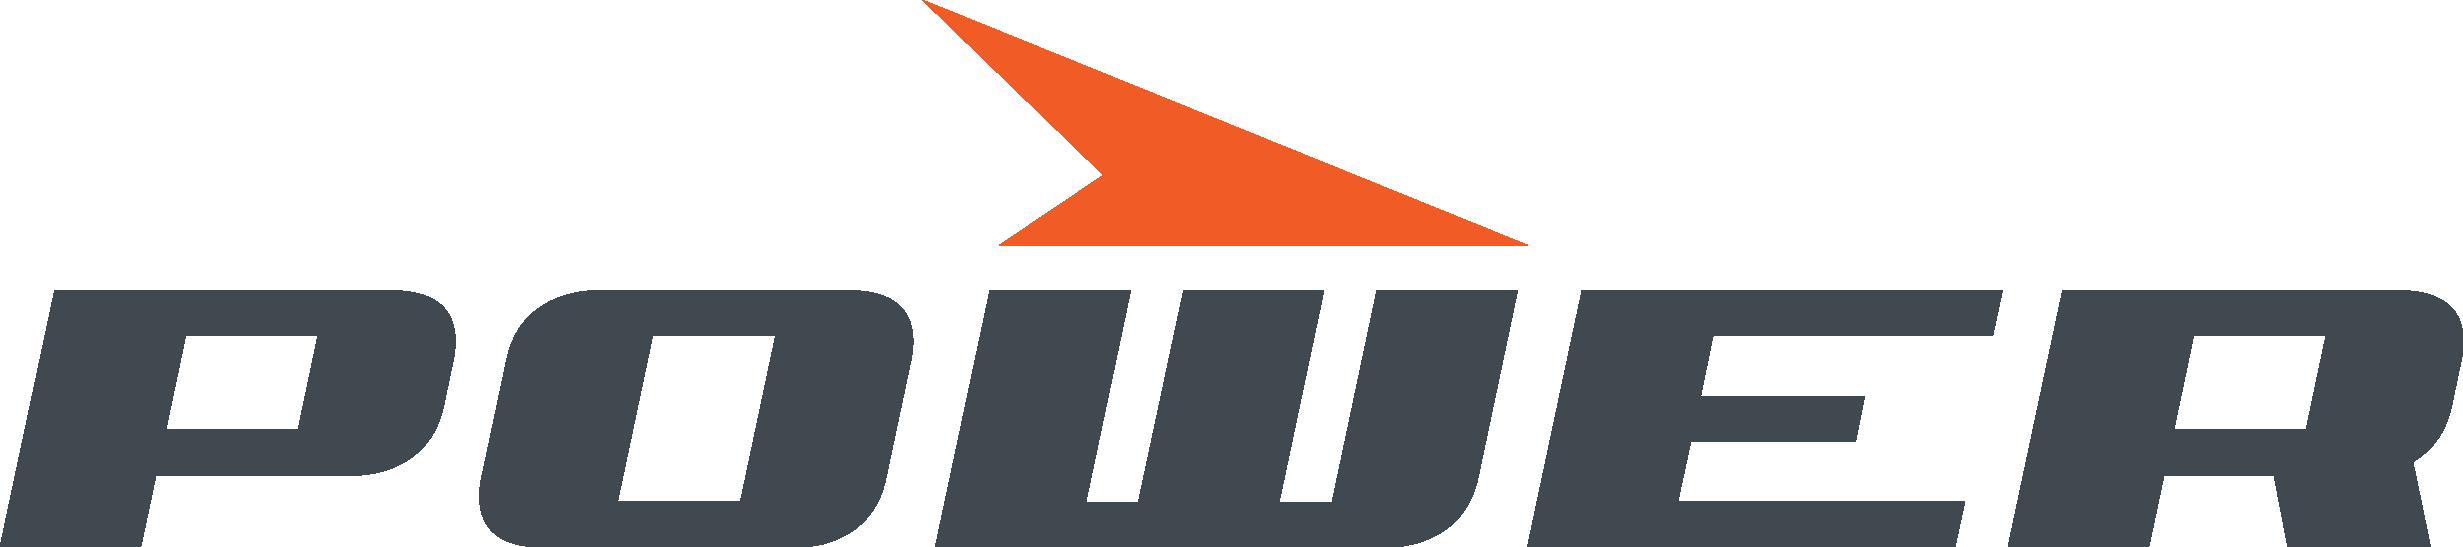 power_logo_positive_png_high